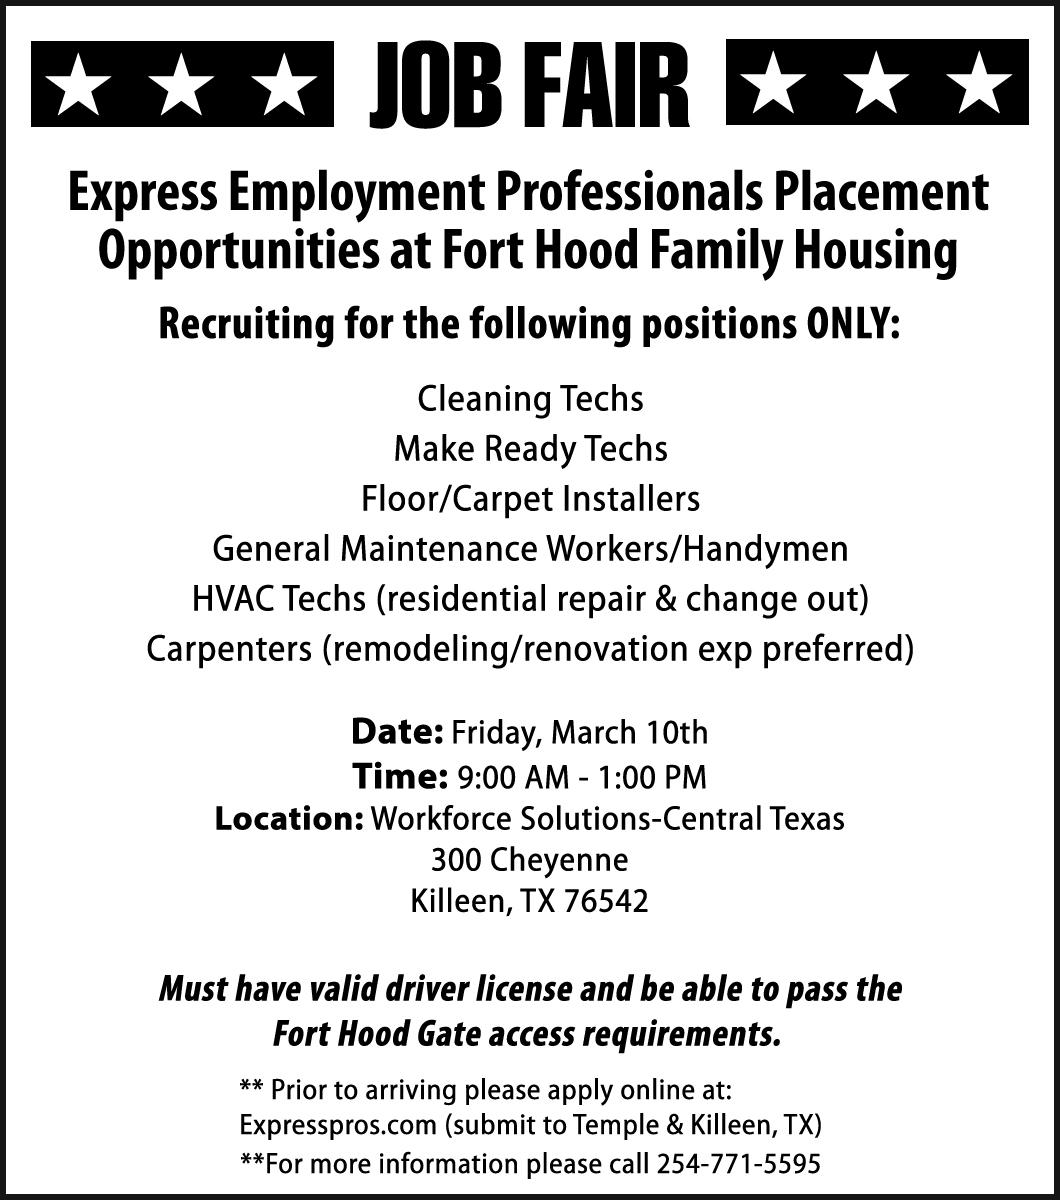 Express Employment Professionals Placement